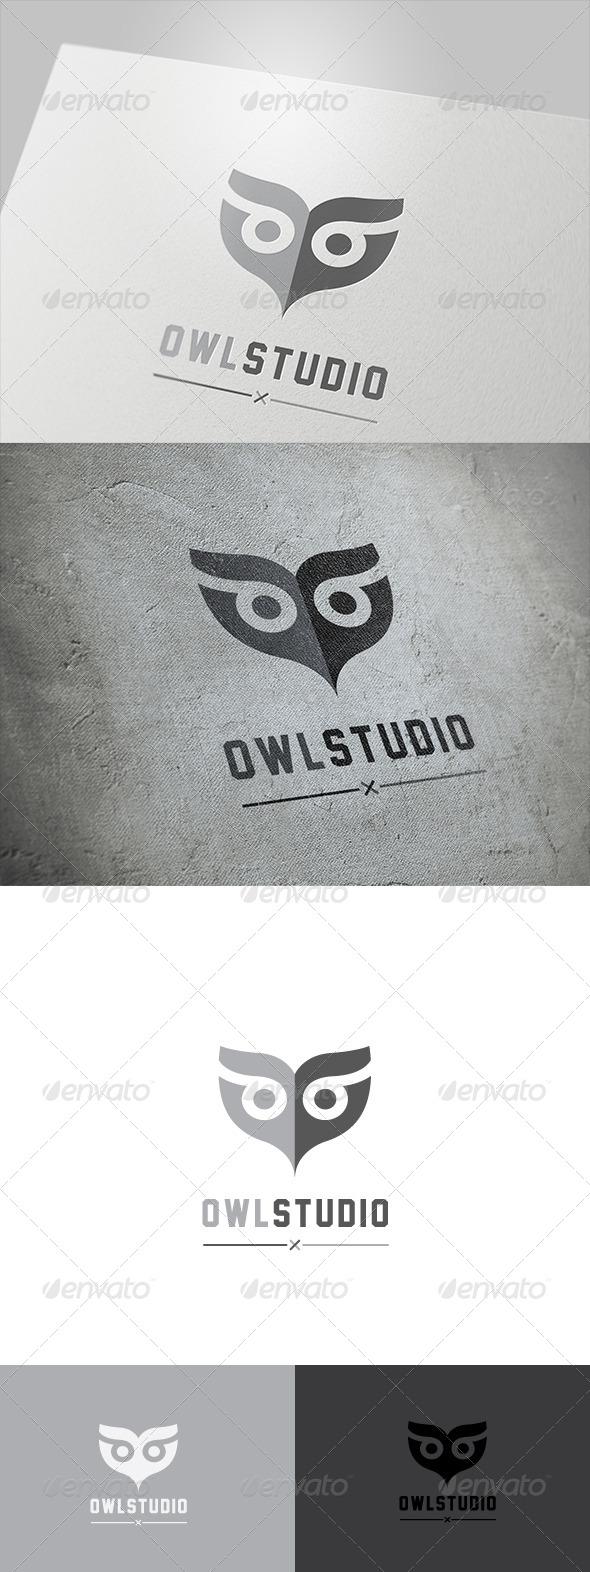 GraphicRiver Owl Studio 5531457